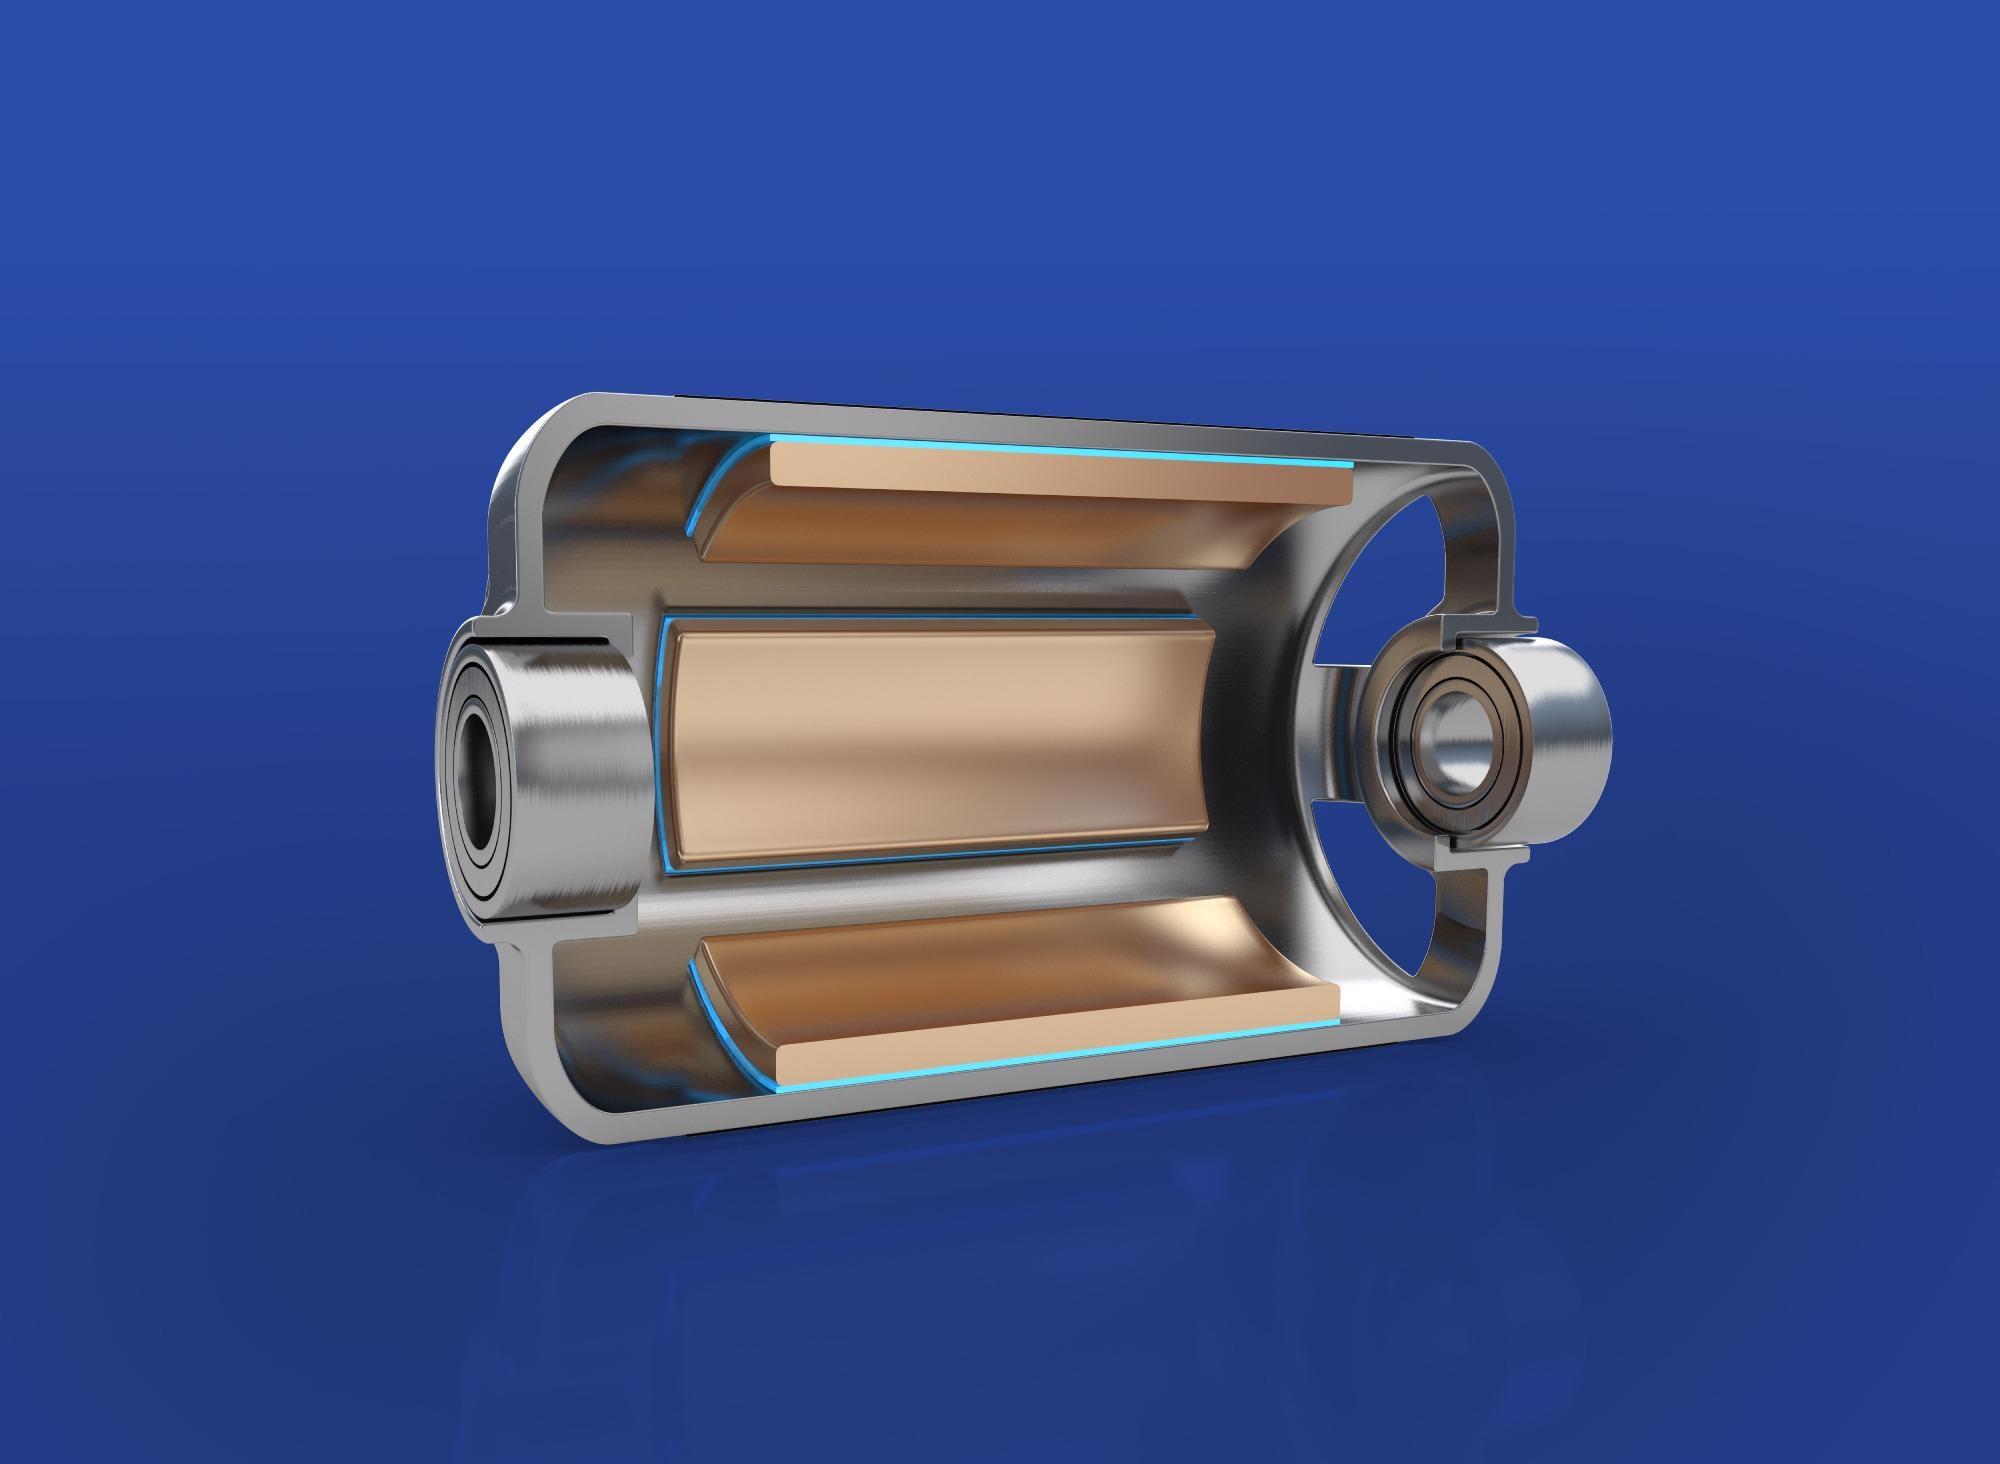 Panacol epoxy adhesive for bonding magnets into electric motors